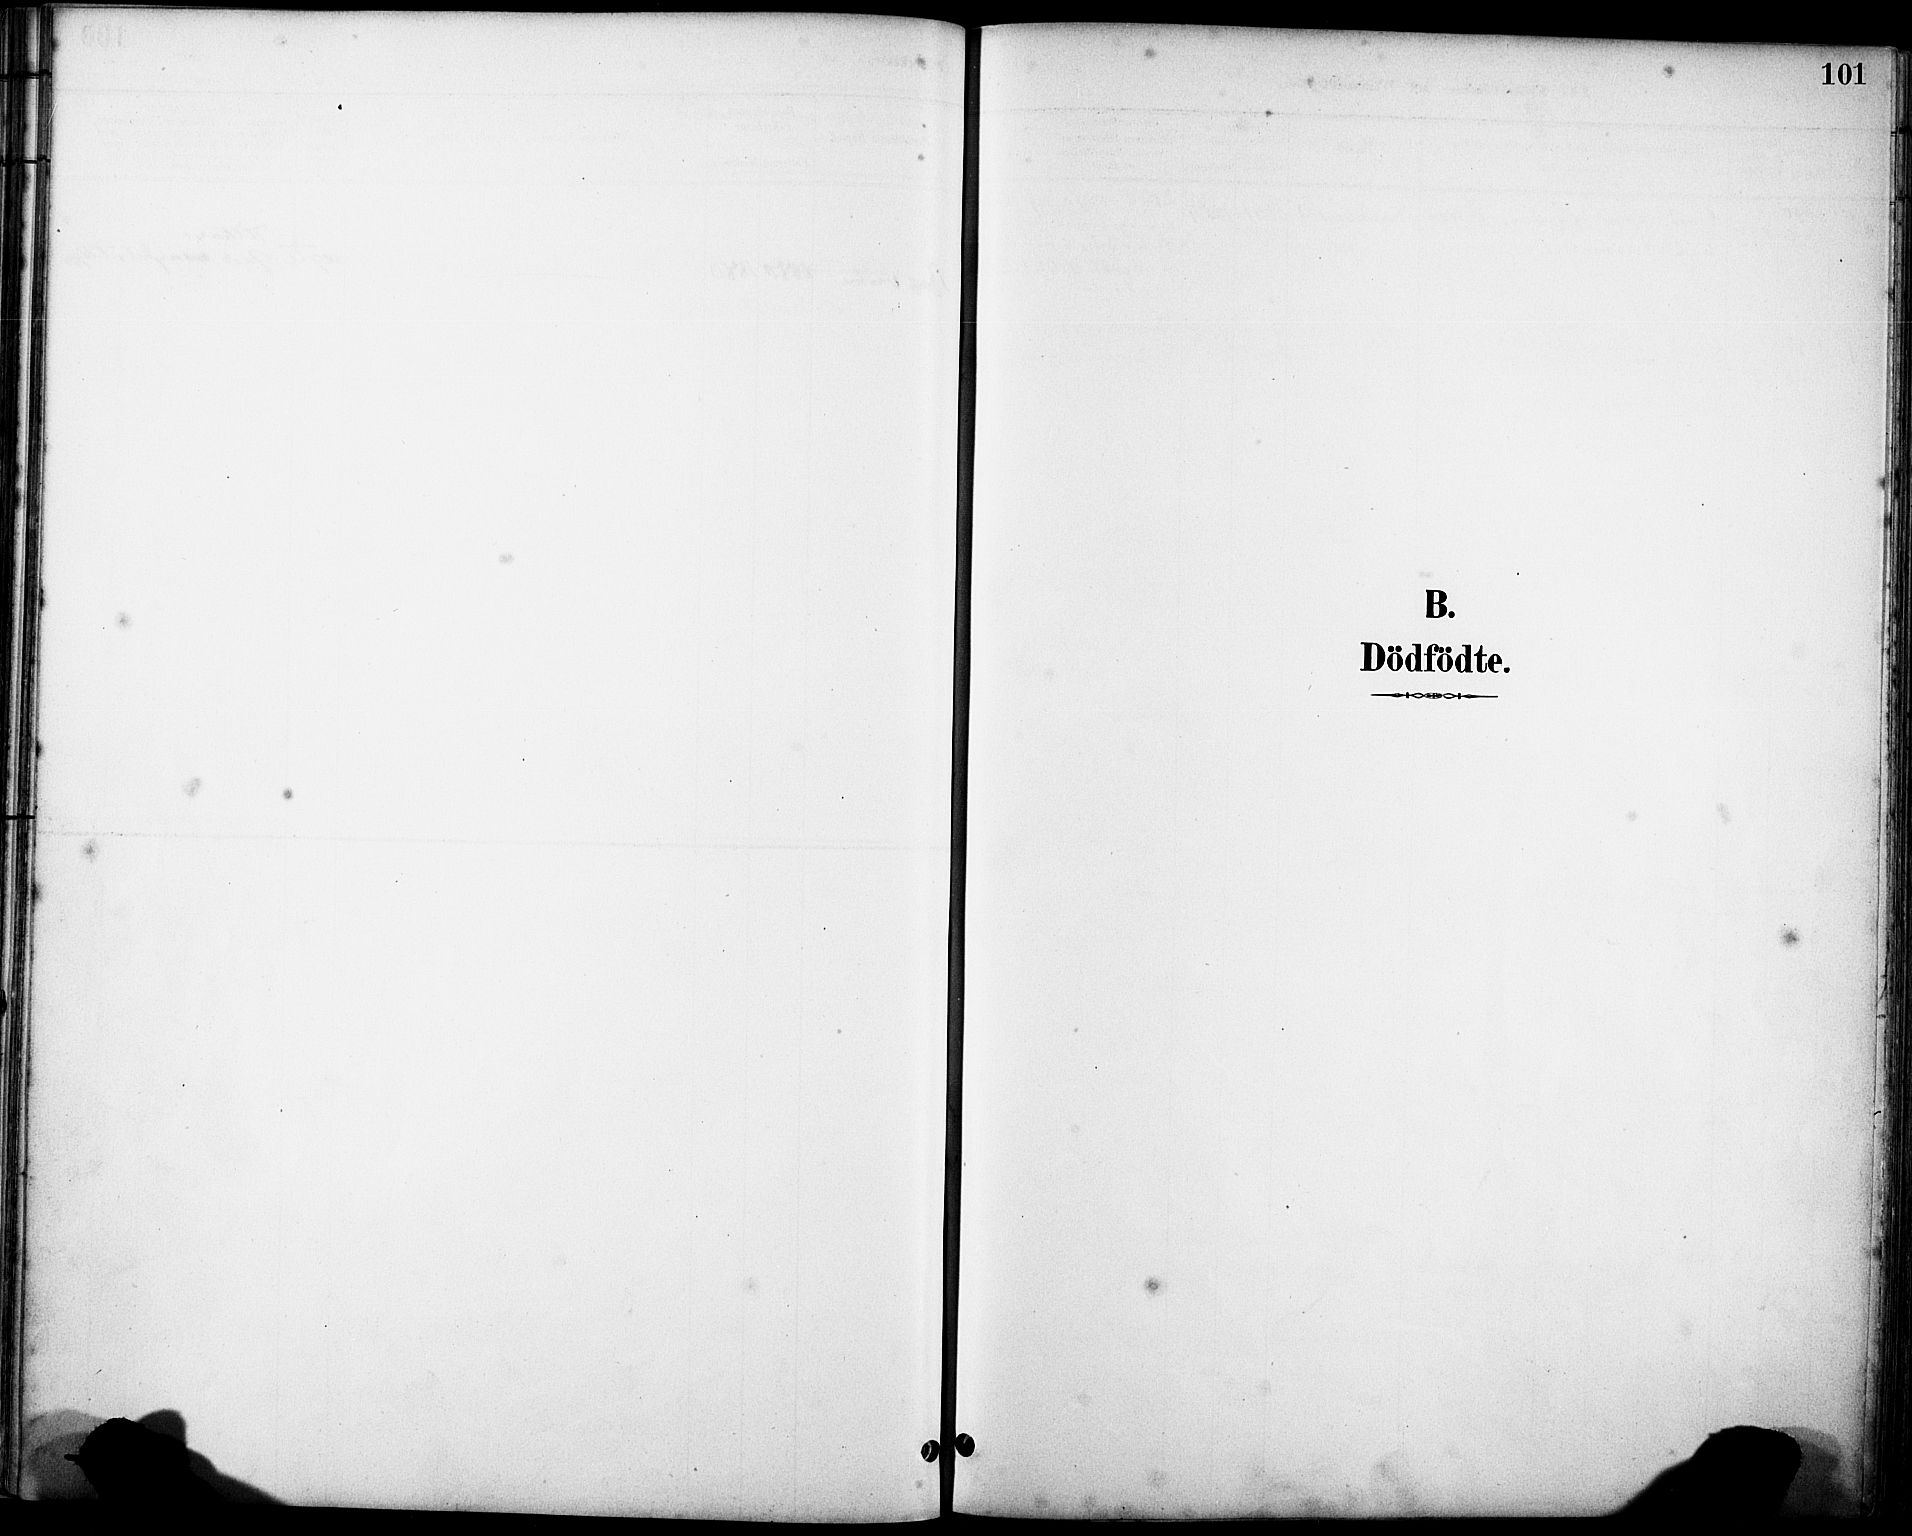 SAST, Klepp sokneprestkontor, 30BA/L0008: Ministerialbok nr. A 9, 1886-1919, s. 101